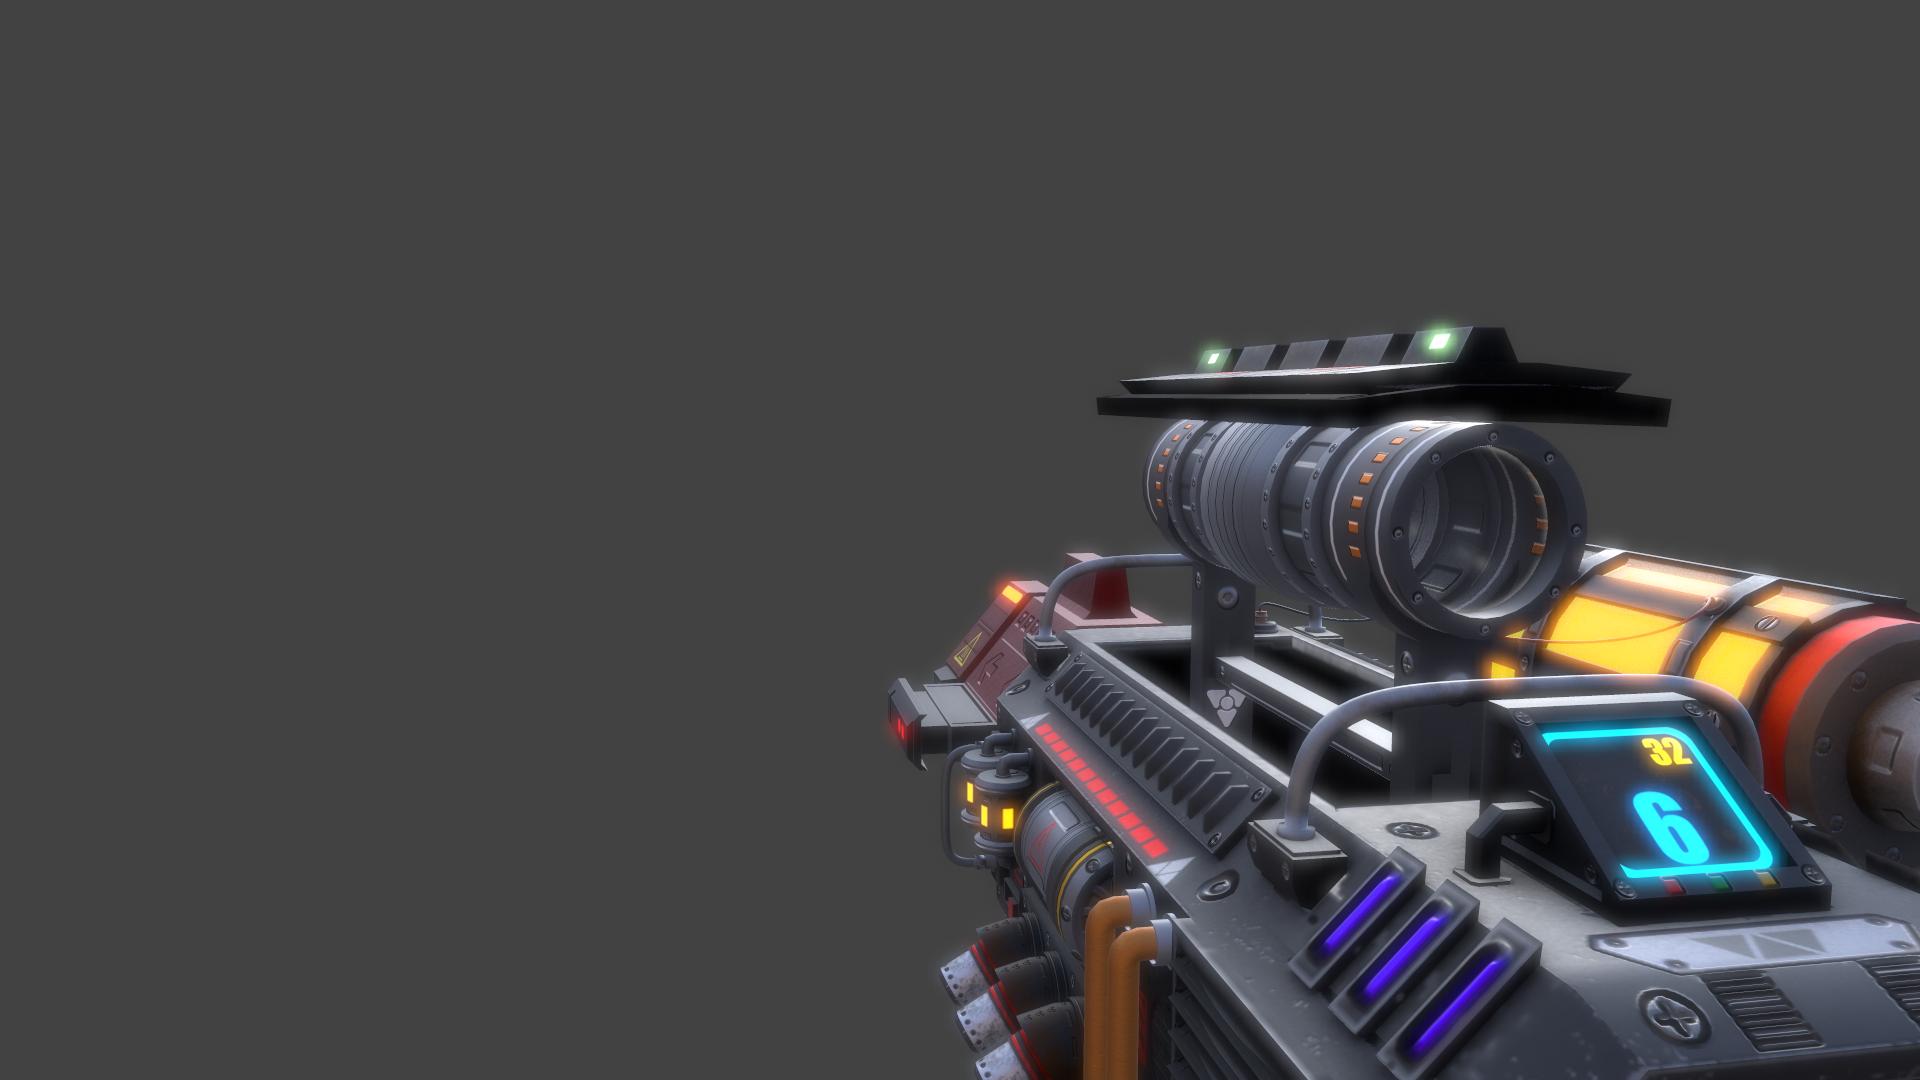 """Hot-Rod"" Sci-Fi Gun"